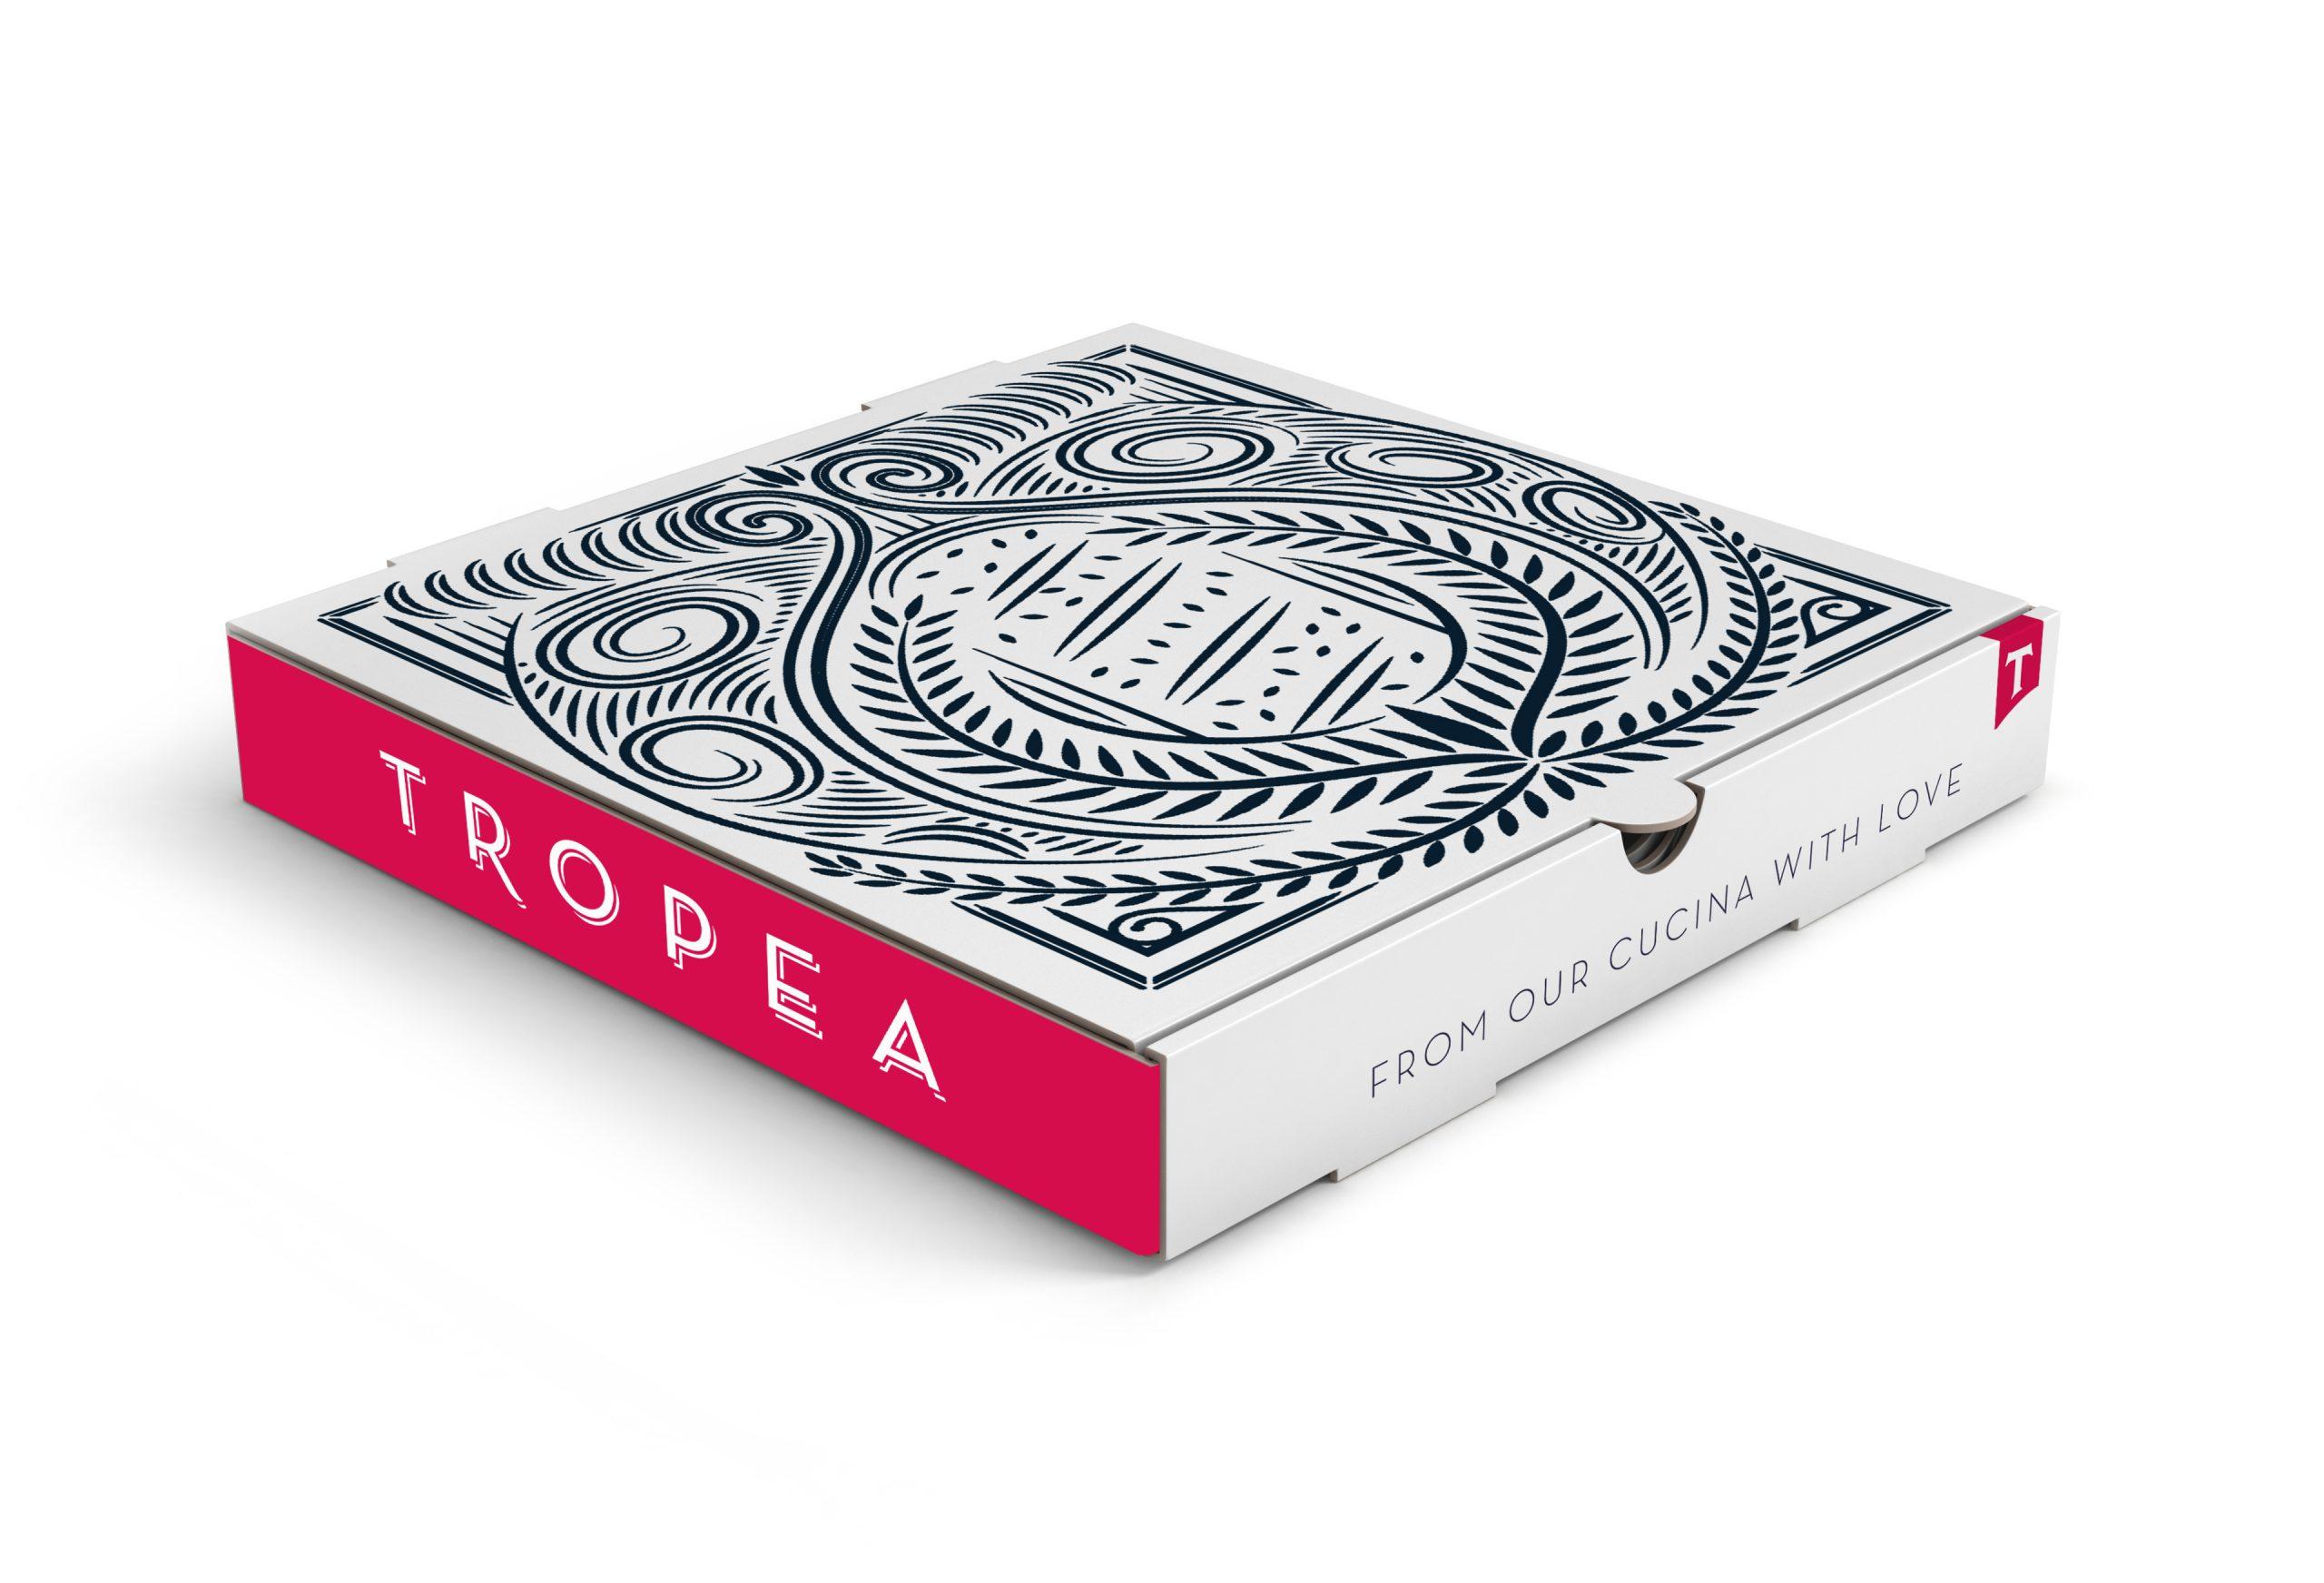 TropeaPizzaBox2